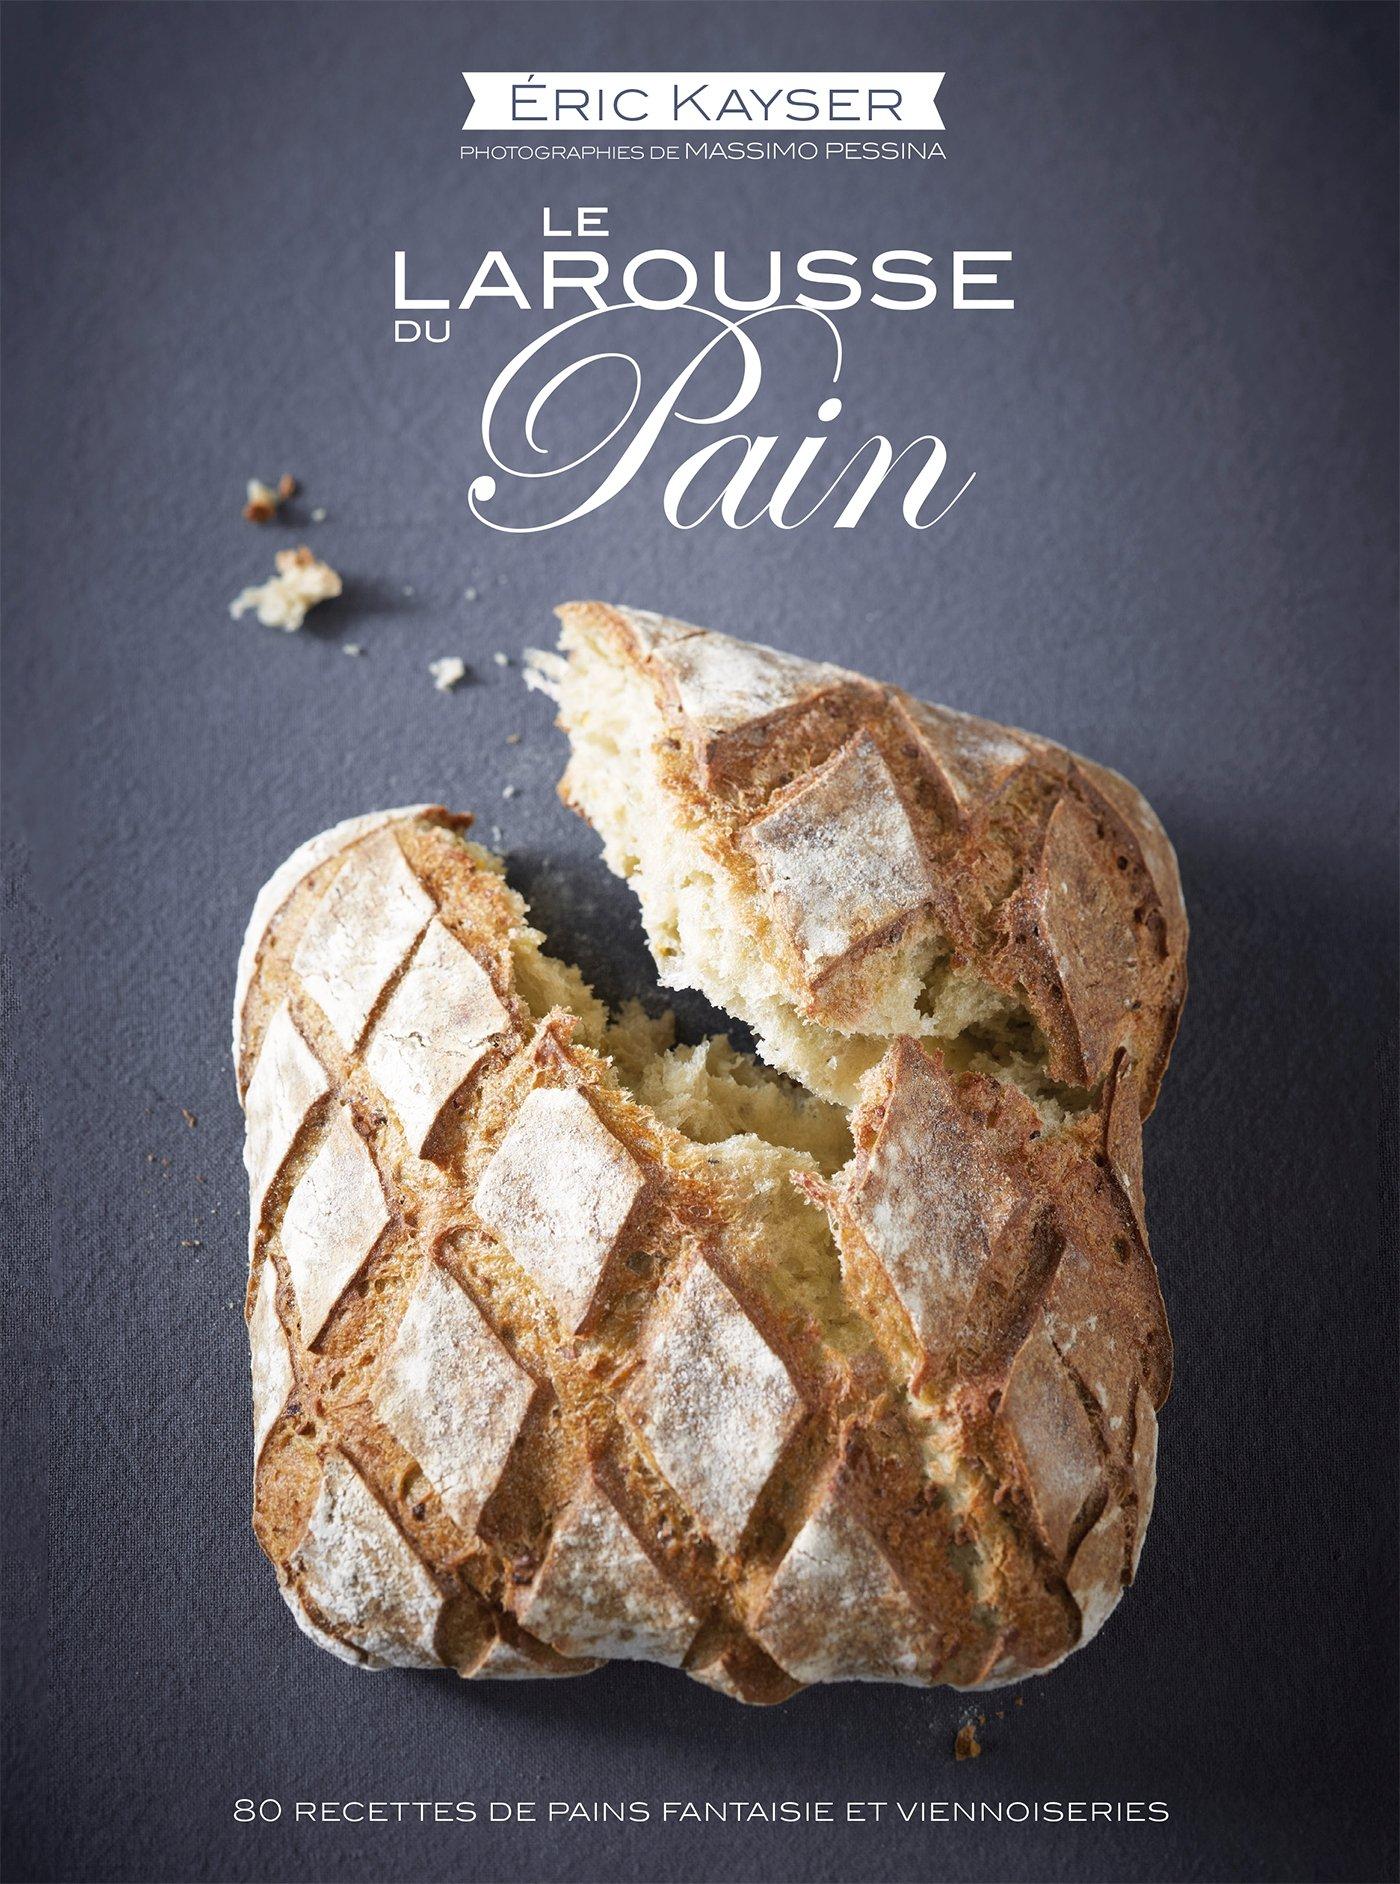 Larousse pain